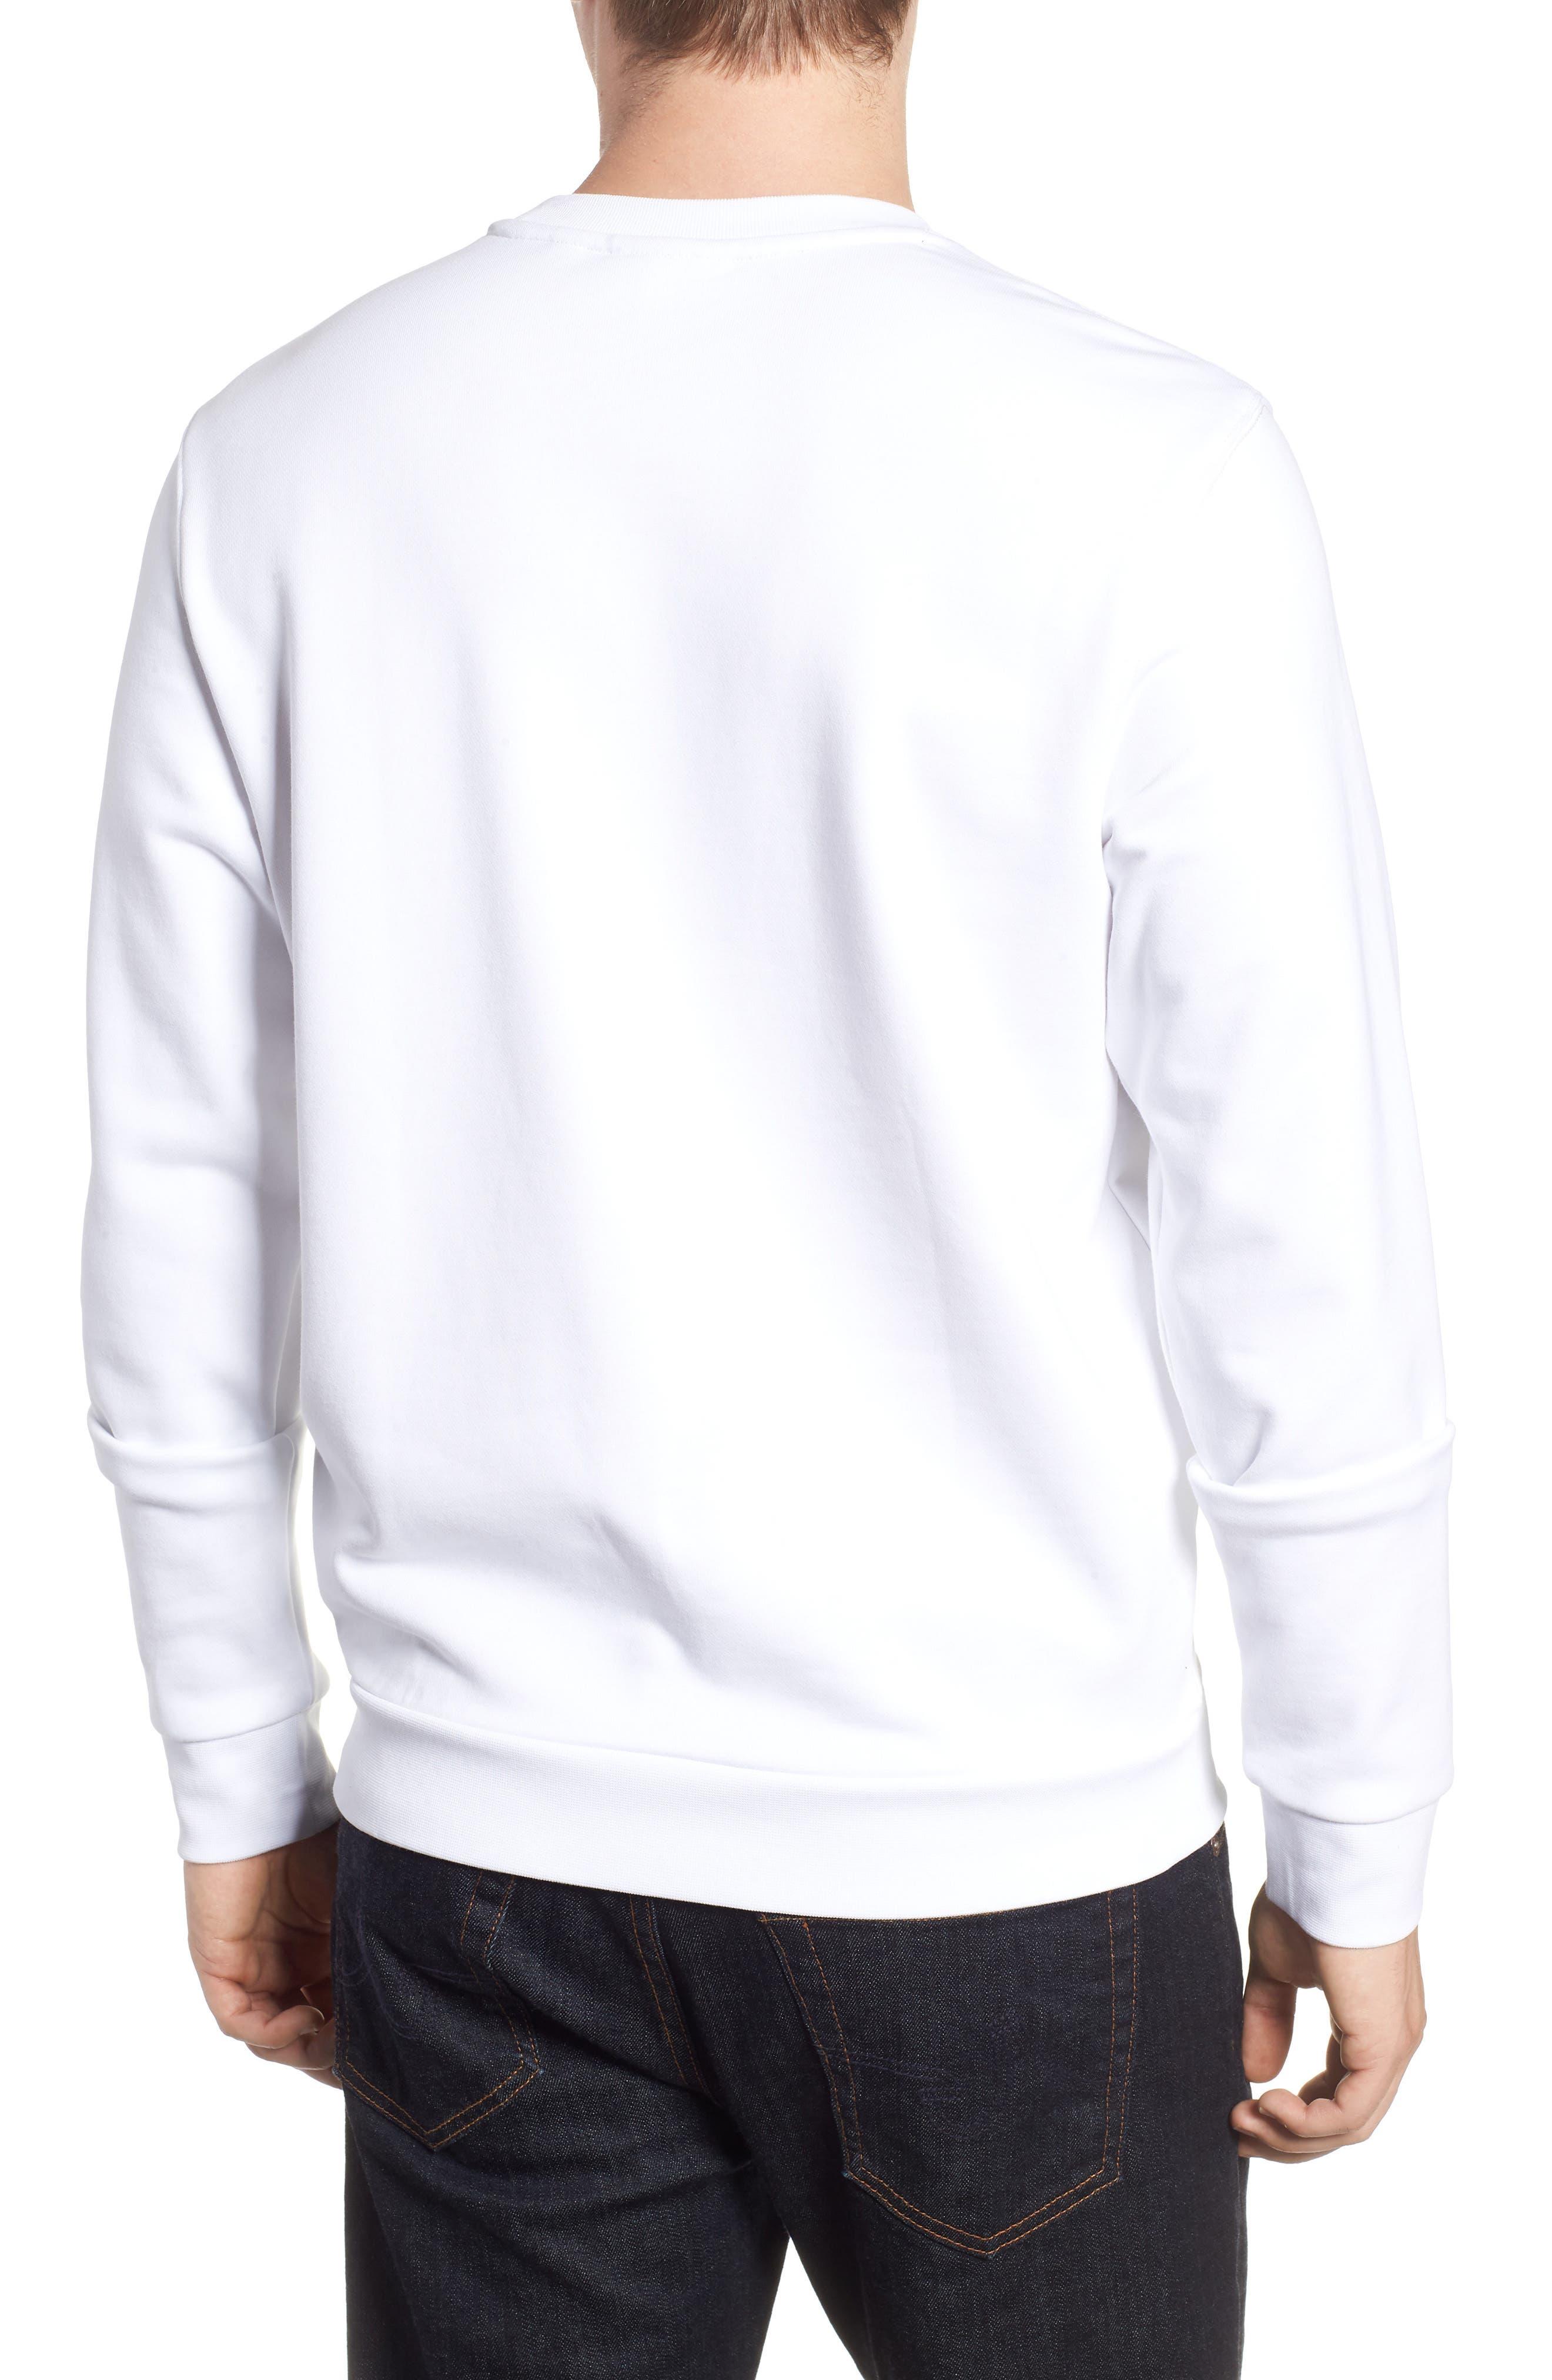 Heritage Regular Fit Sweatshirt,                             Alternate thumbnail 2, color,                             WHITE/ NAVY BLUE